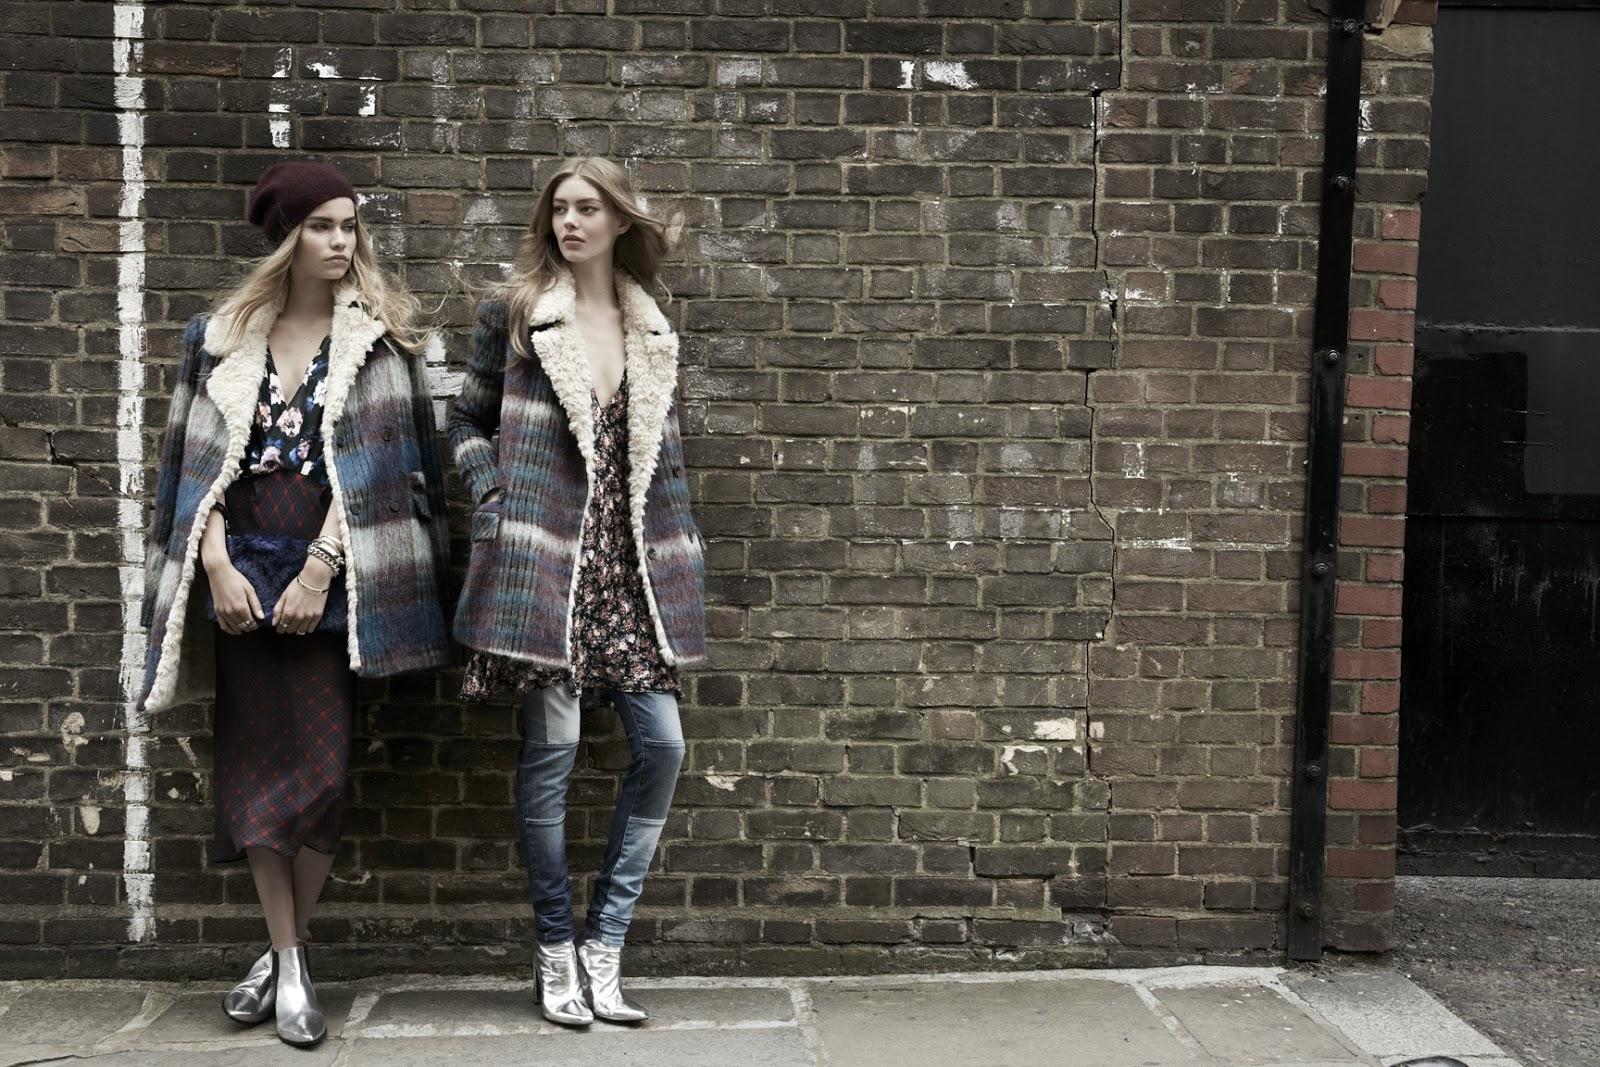 48340c3f Zara Trafaluc Fall 2013 Ad Campaign - FRONT ROW